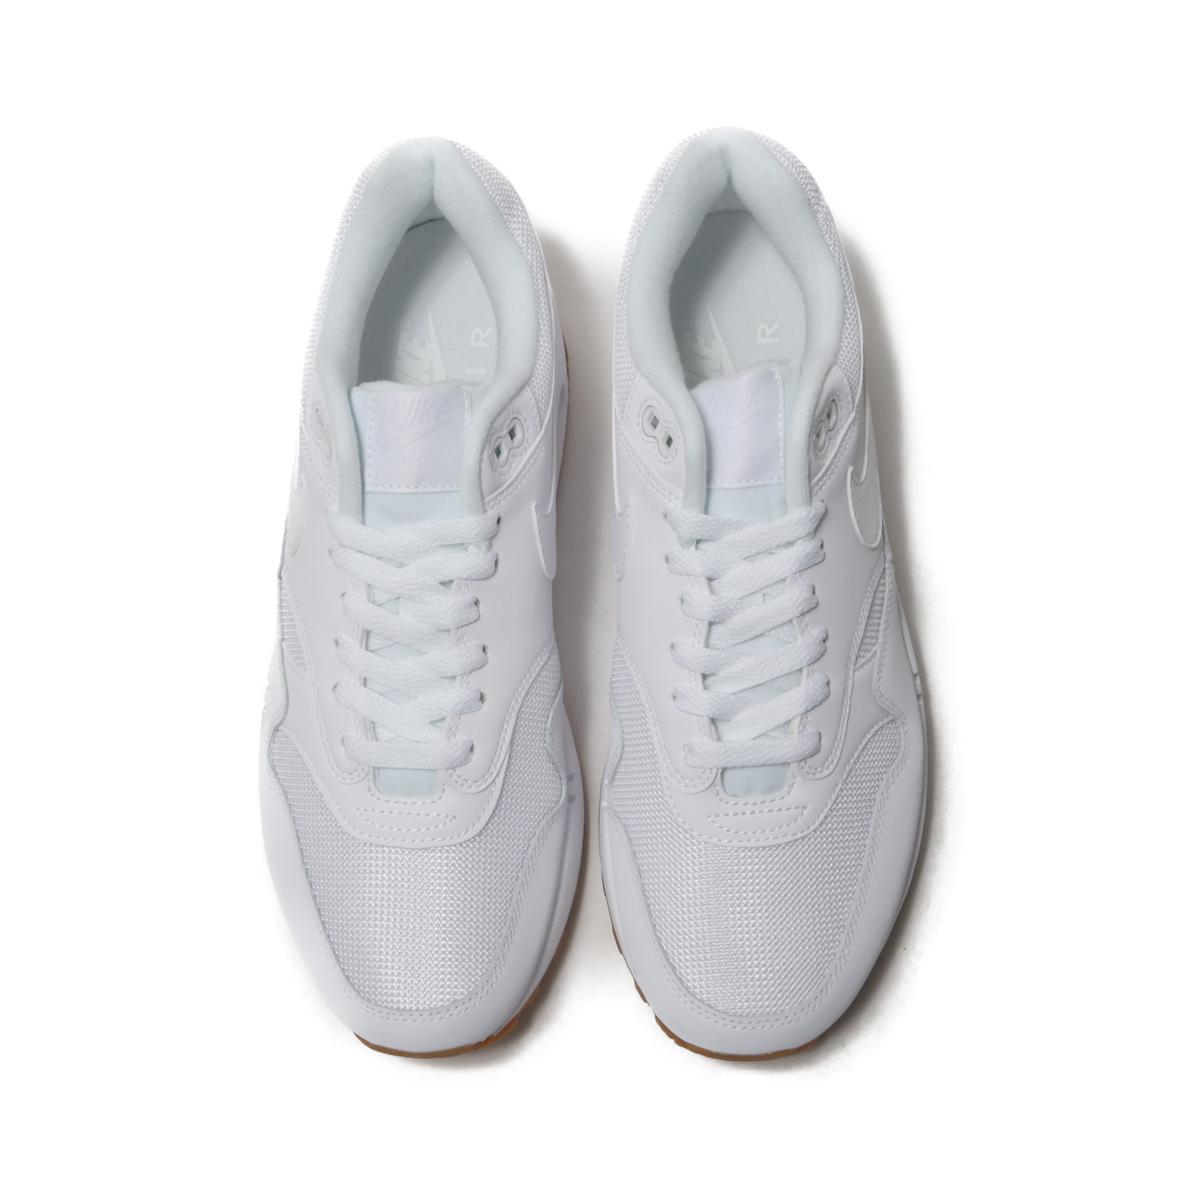 first rate 9e34e 8e91a NIKE AIR MAX 1 (Kie Ney AMAX 1) WHITE WHITE-WHITE-GUM MED BROWN 18FA-I